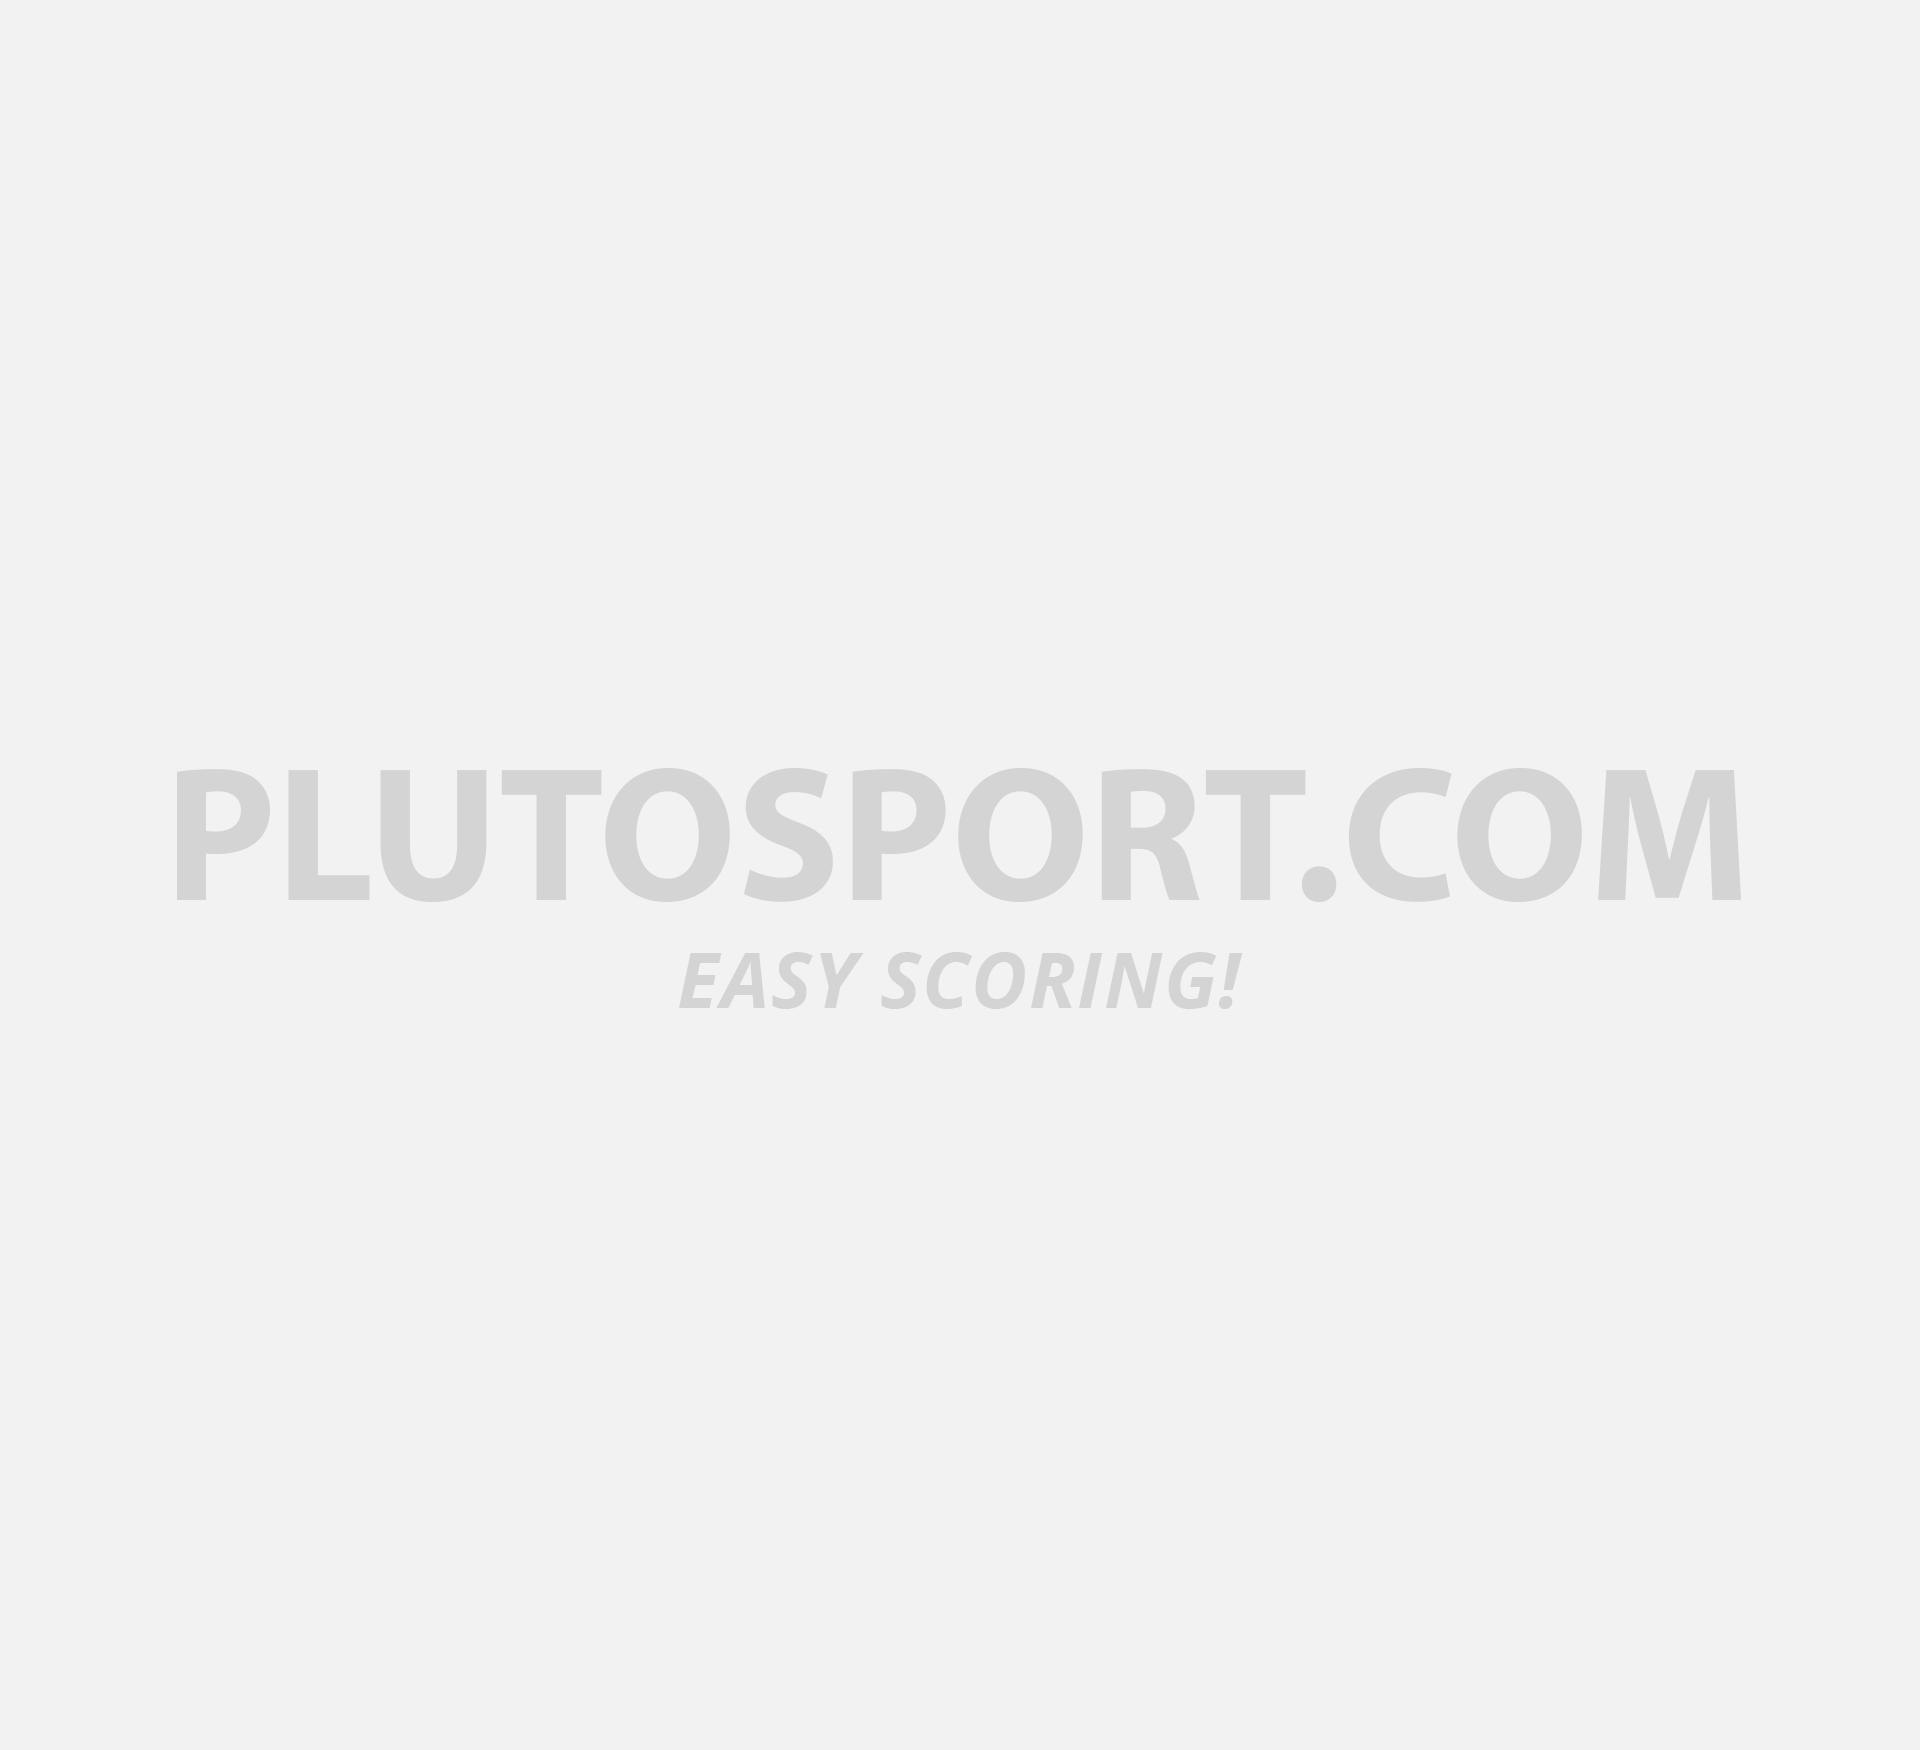 Adidas Predator Soccer Shoes Prices